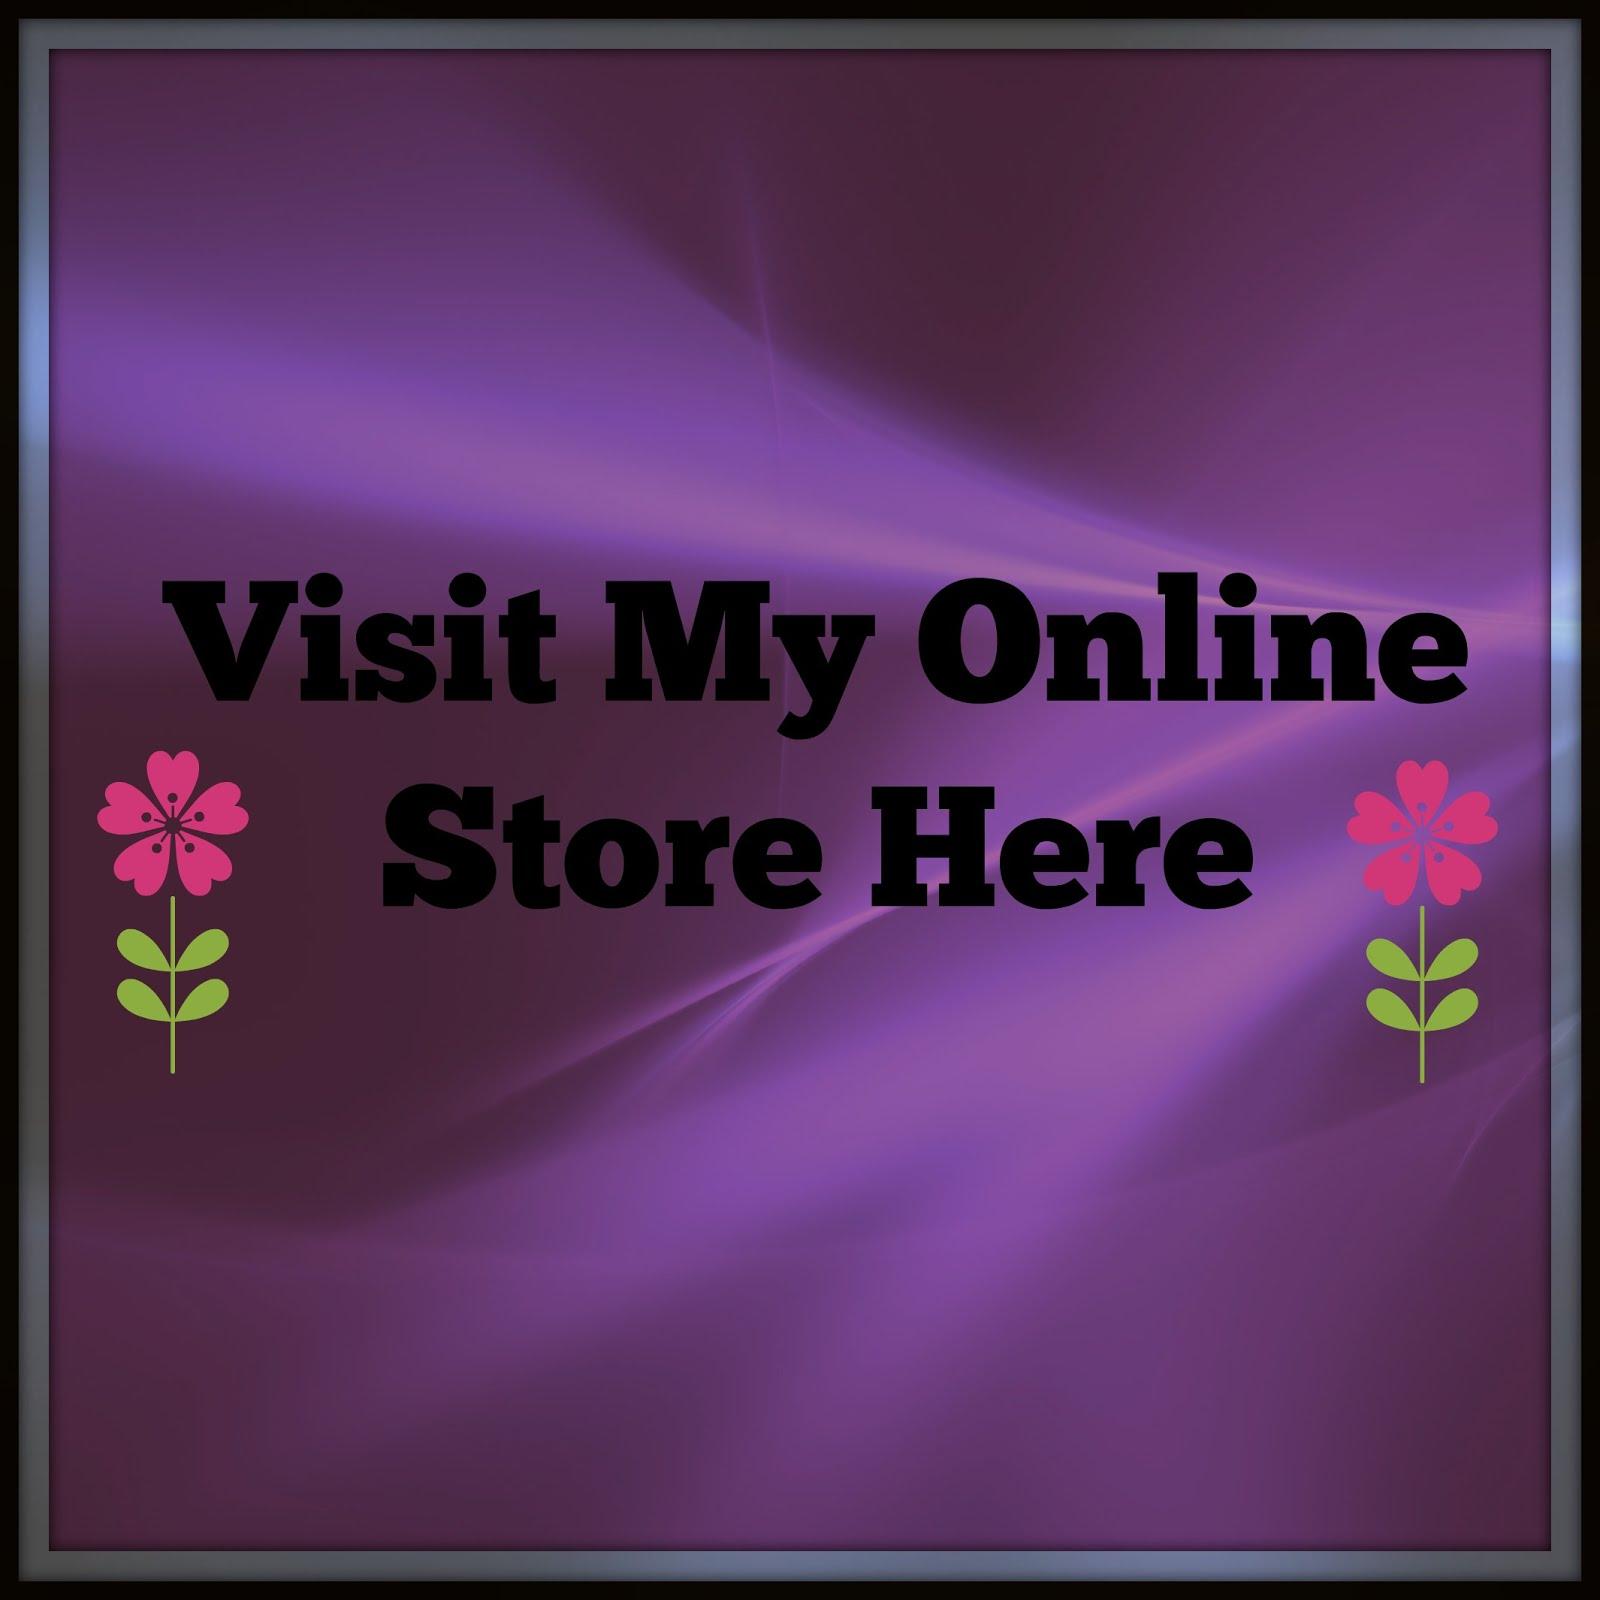 Online Store Link